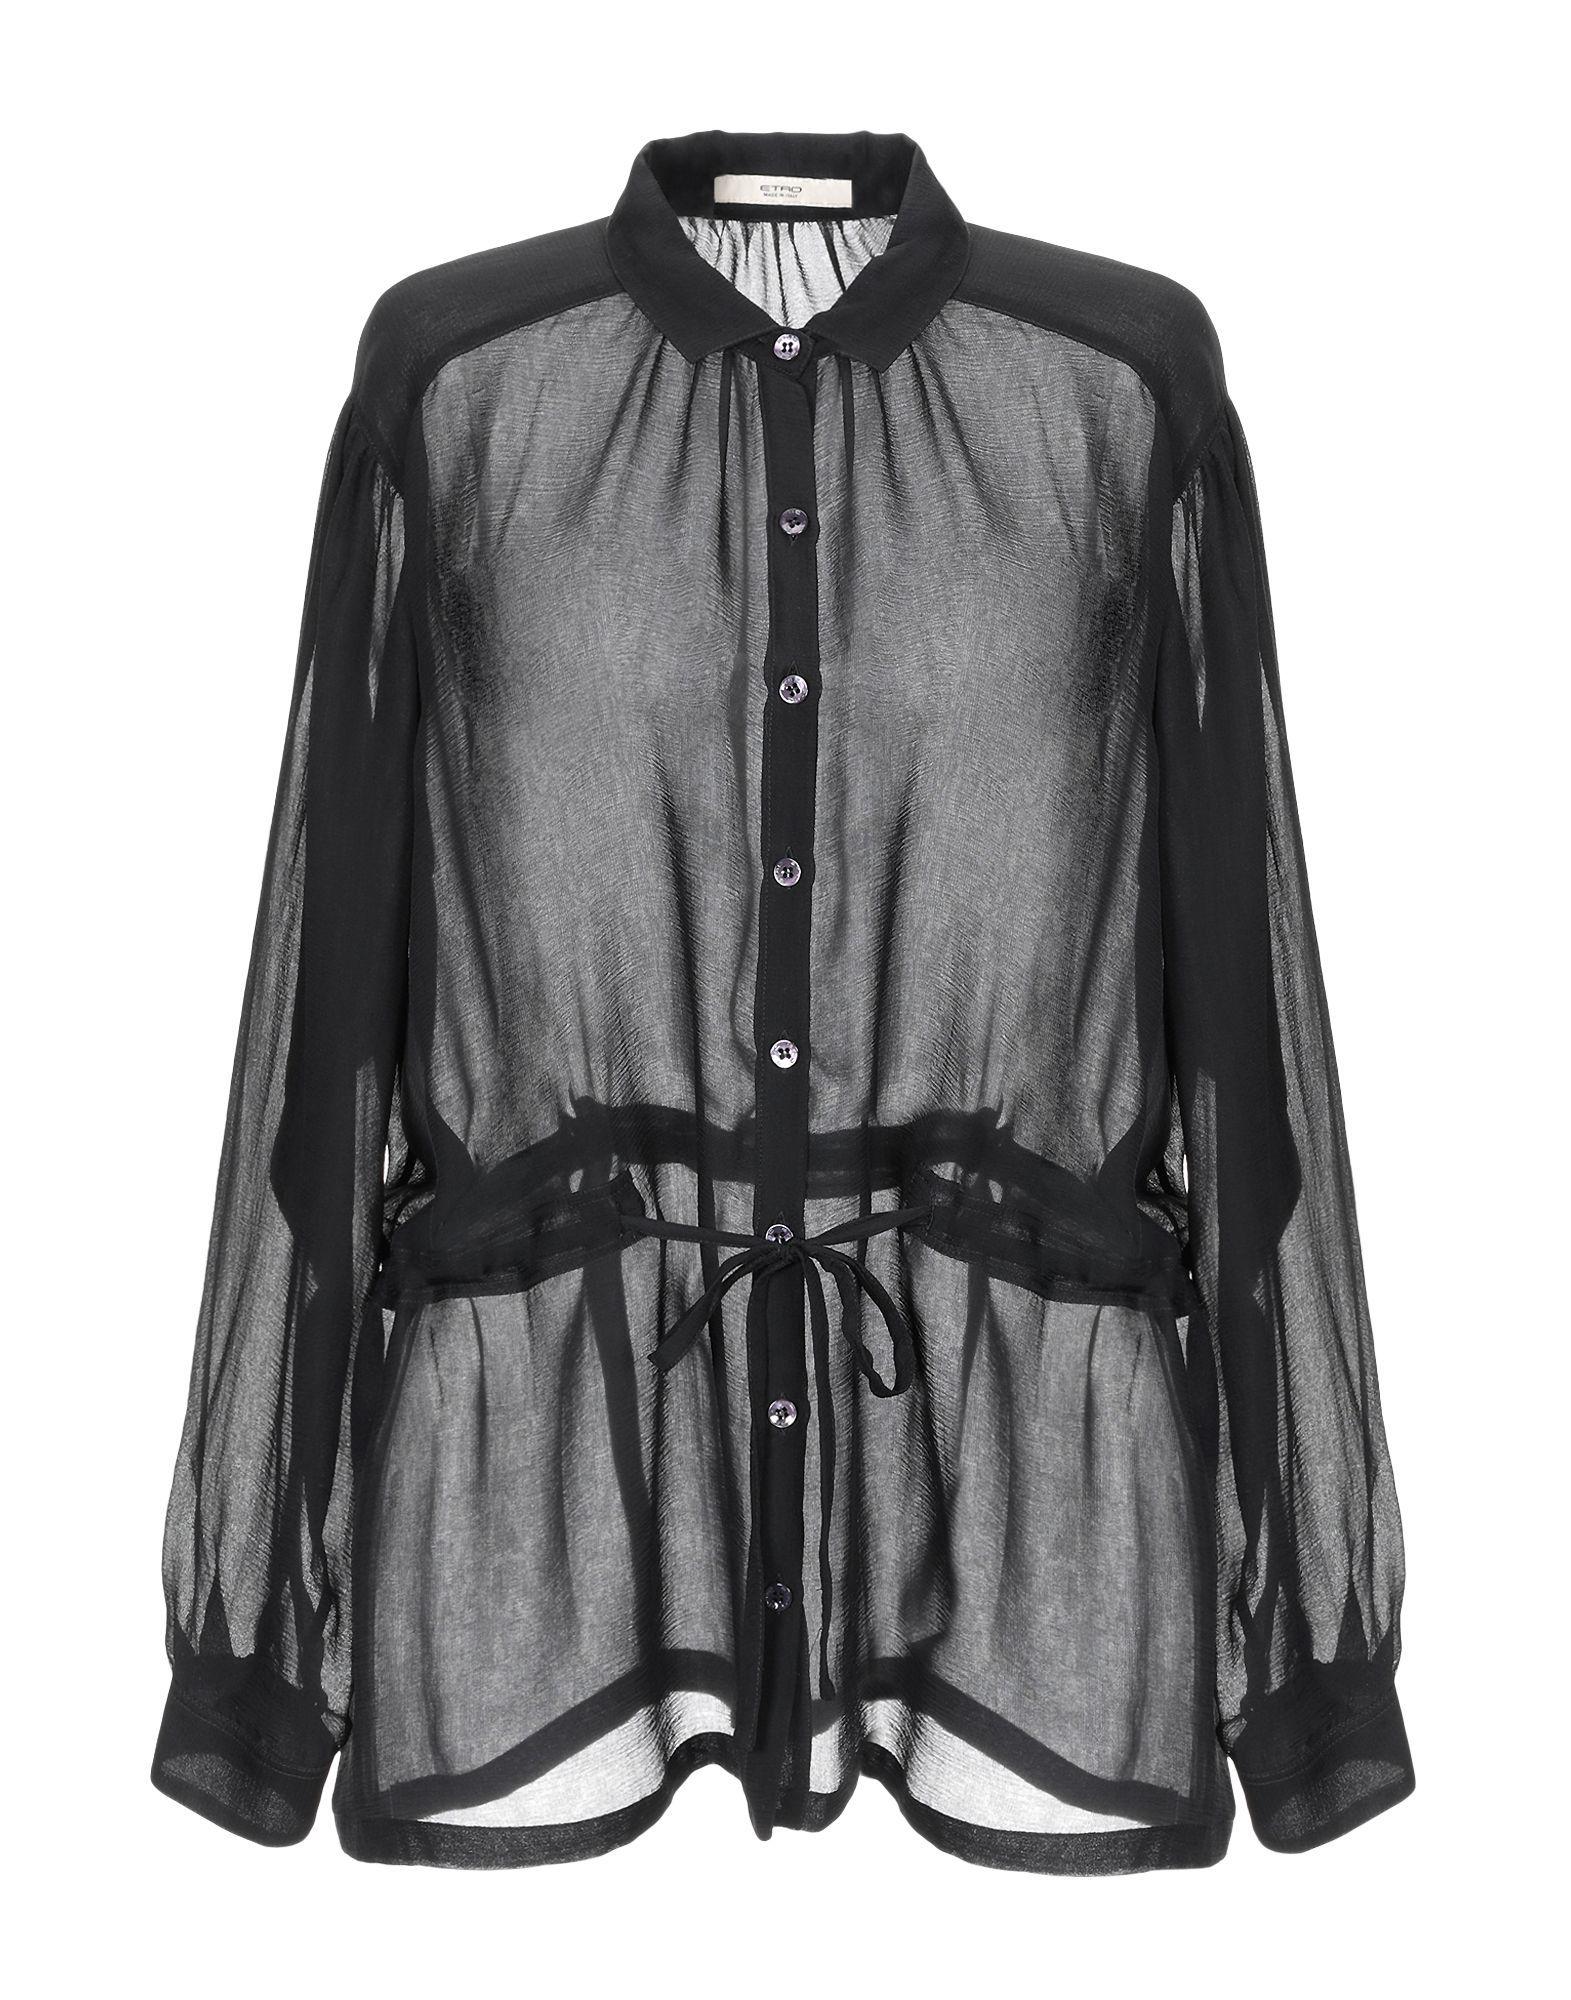 Etro Black Silk Shirt